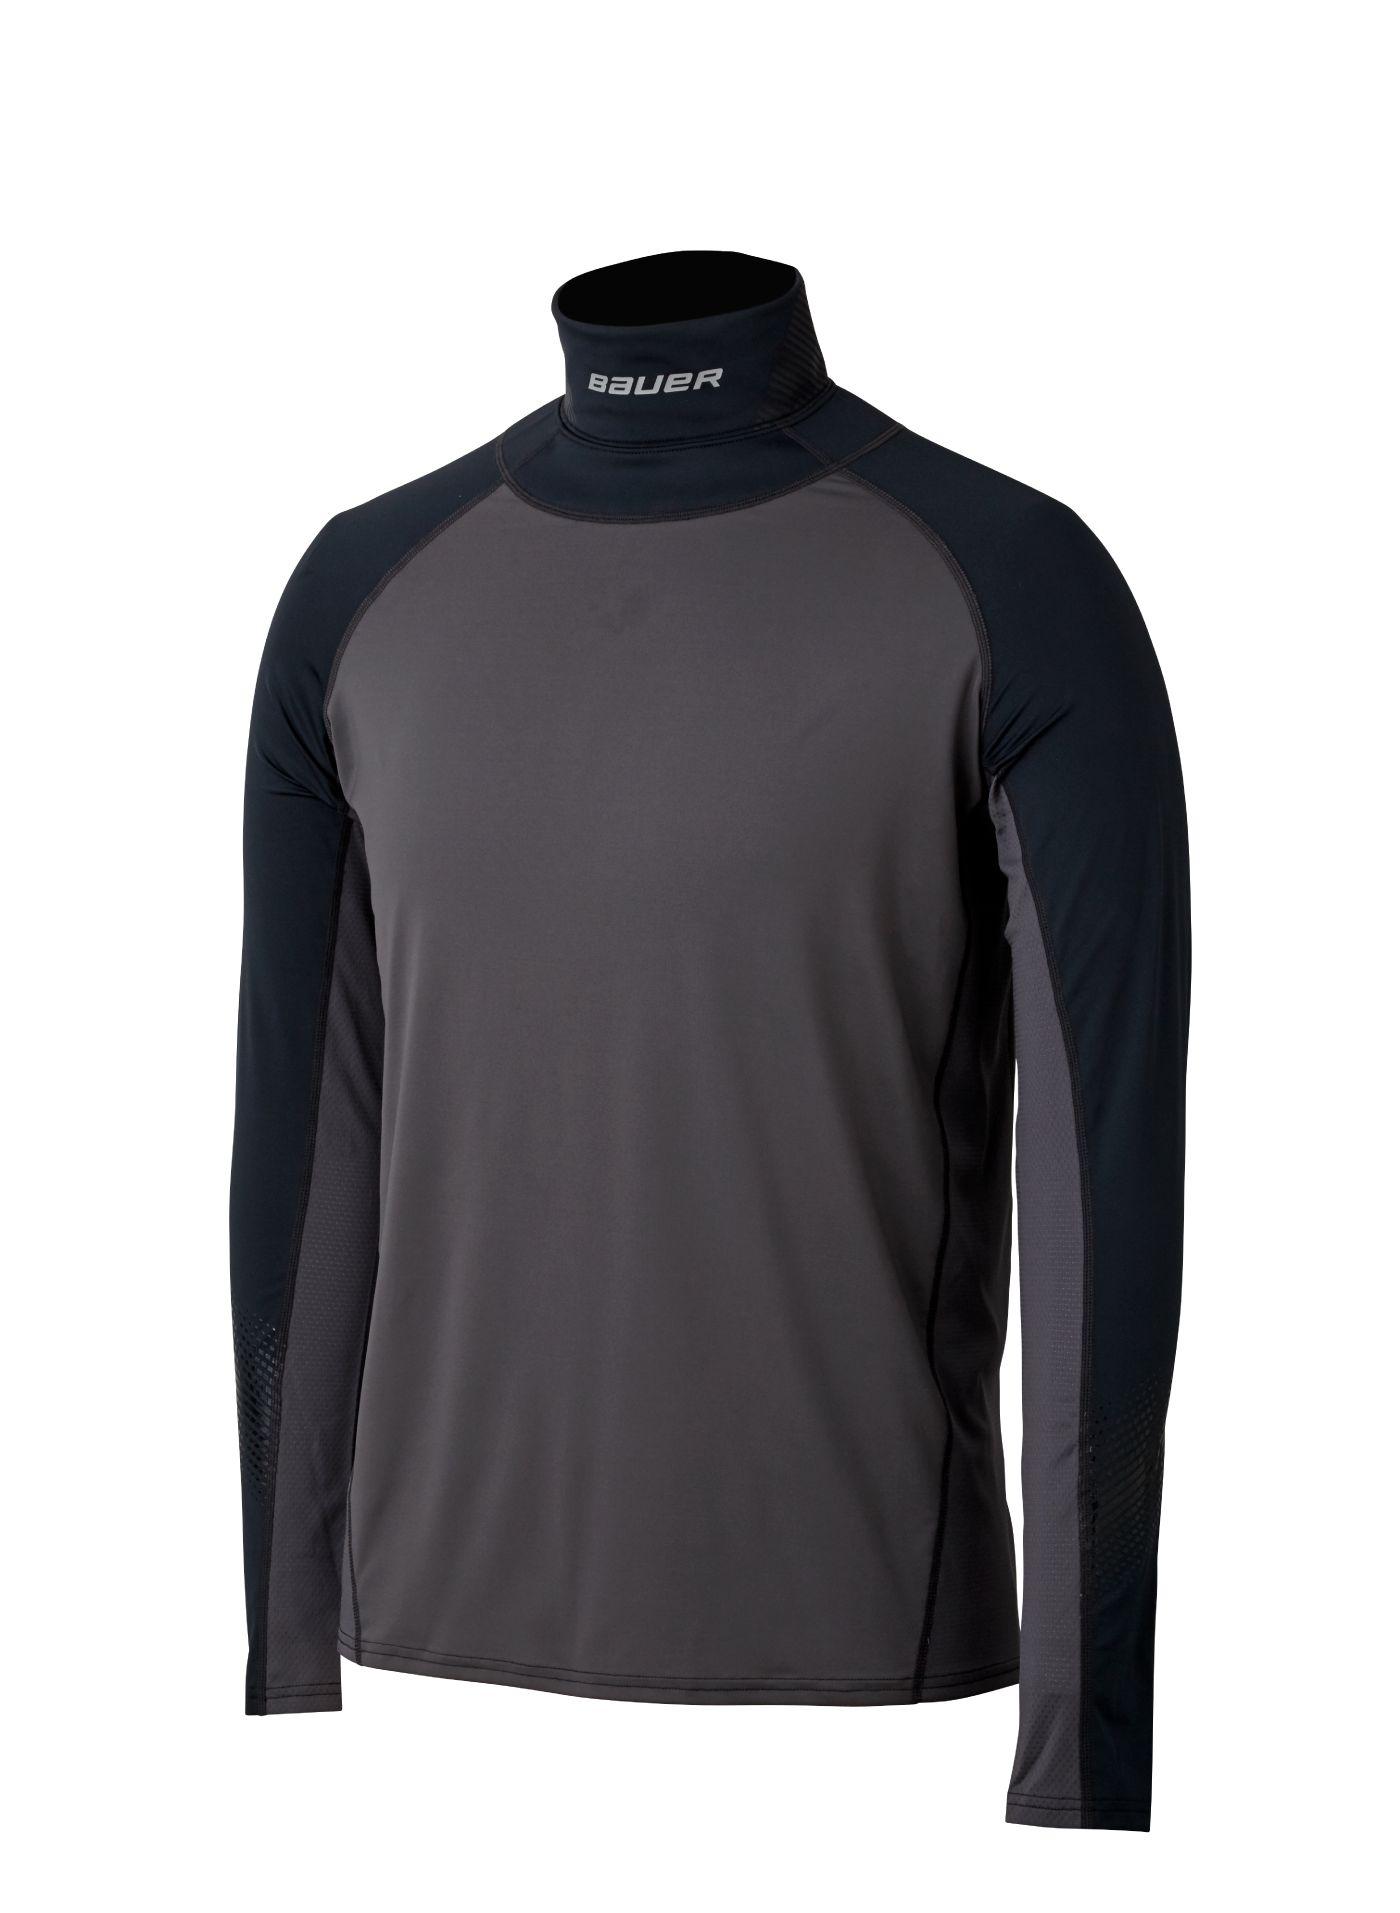 Bauer Men's Neck Protect Long Sleeve Hockey Shirt